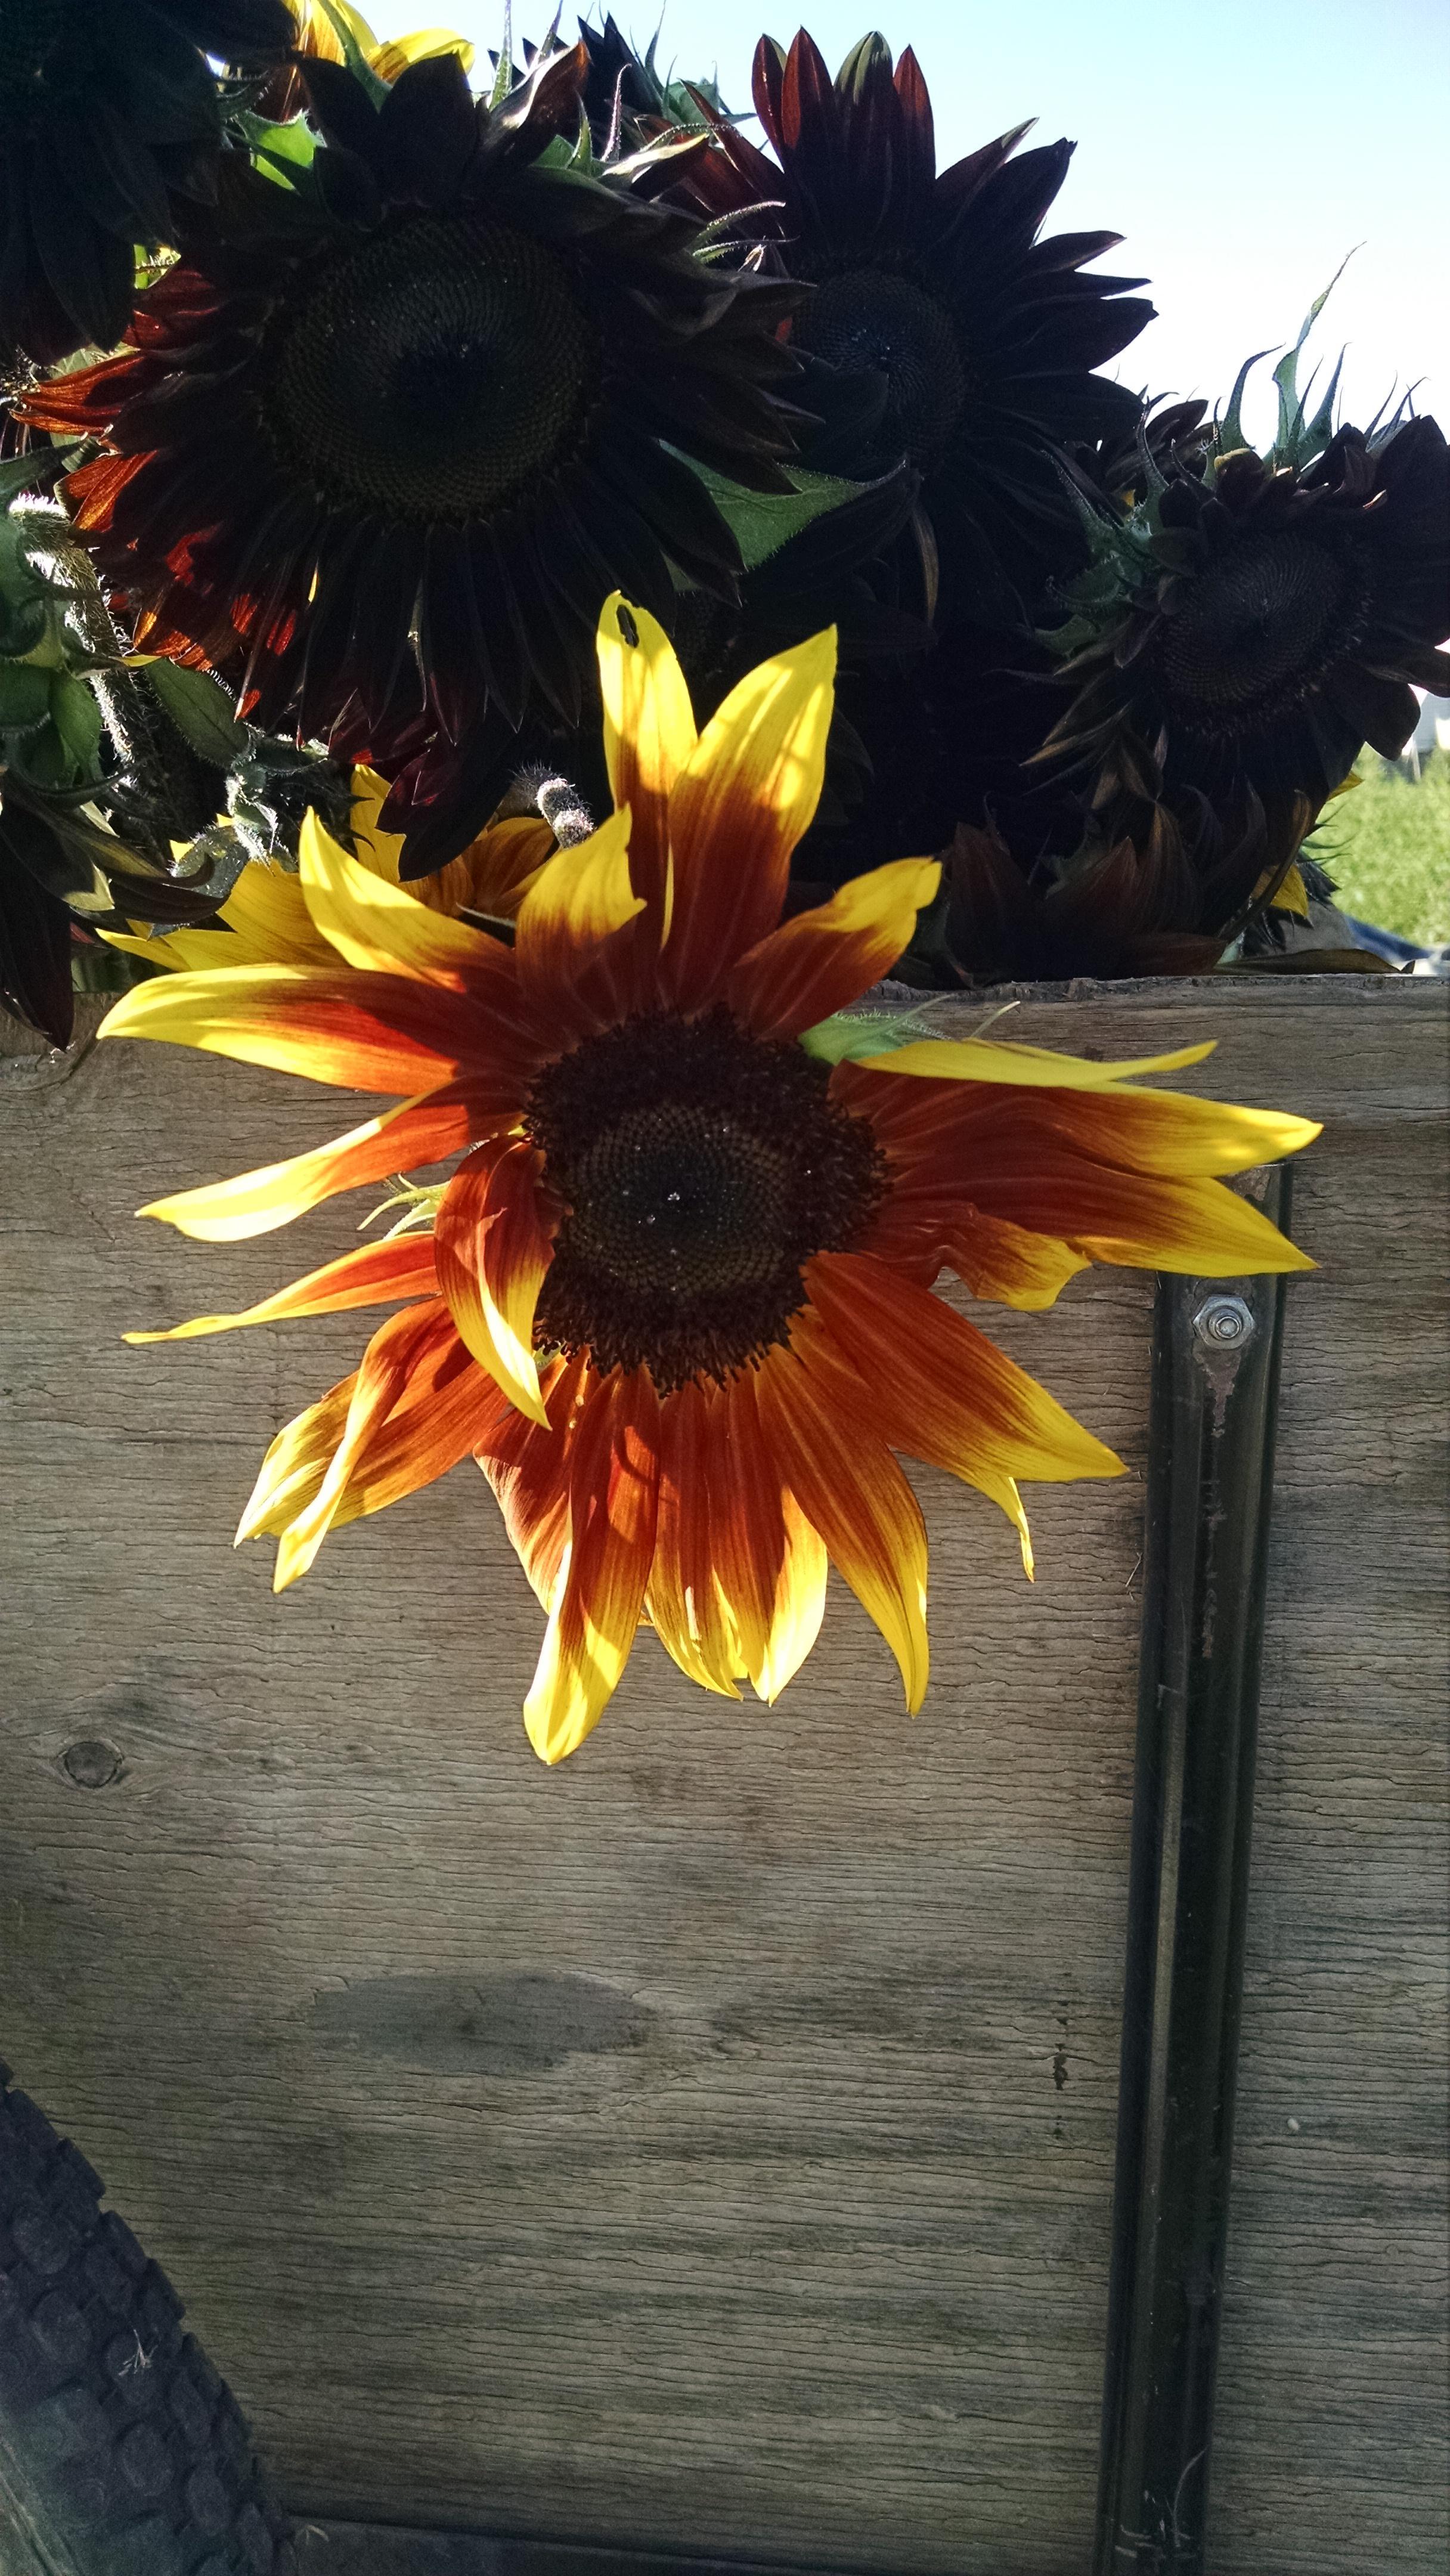 Sunlight catches the petals